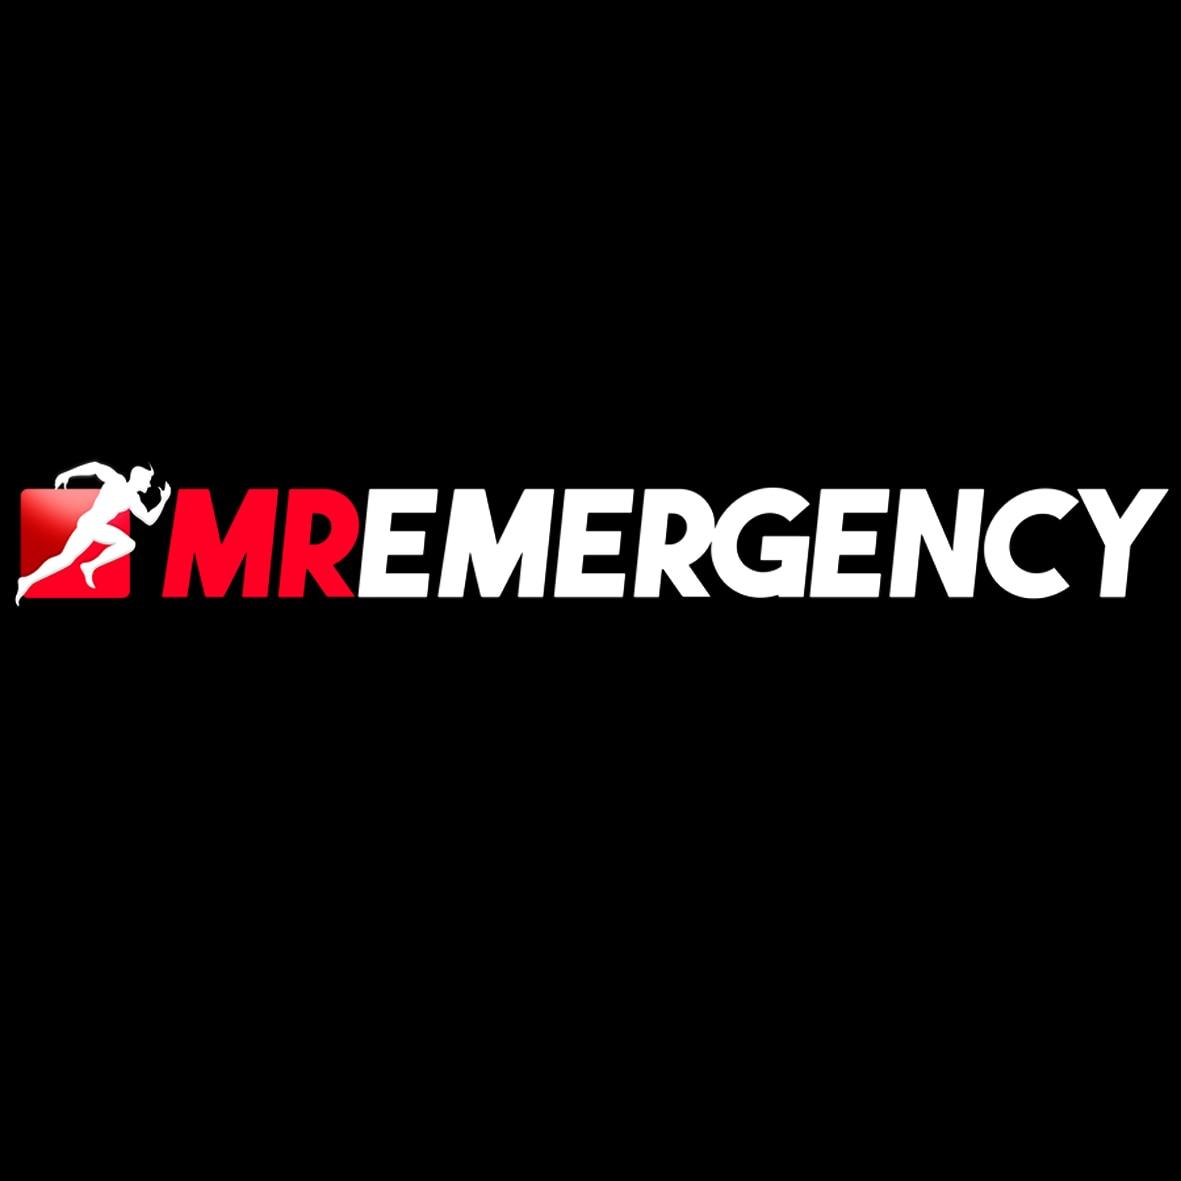 Mr Emergency Clarkson